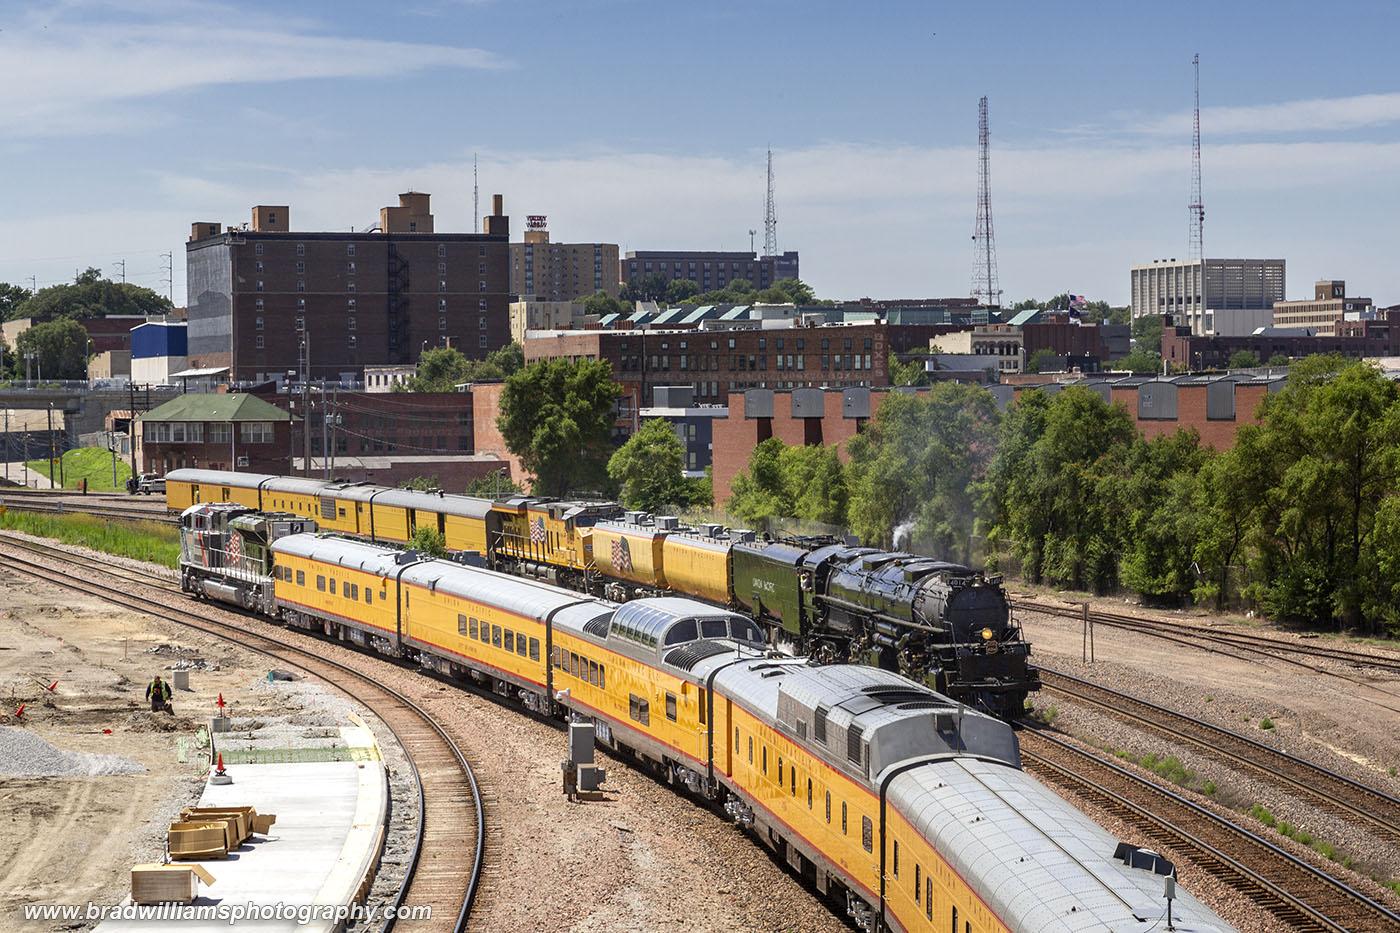 BigBoy, Union Pacific, Steam, Locomotive, Railroad, Train, History, Nebraska, photo